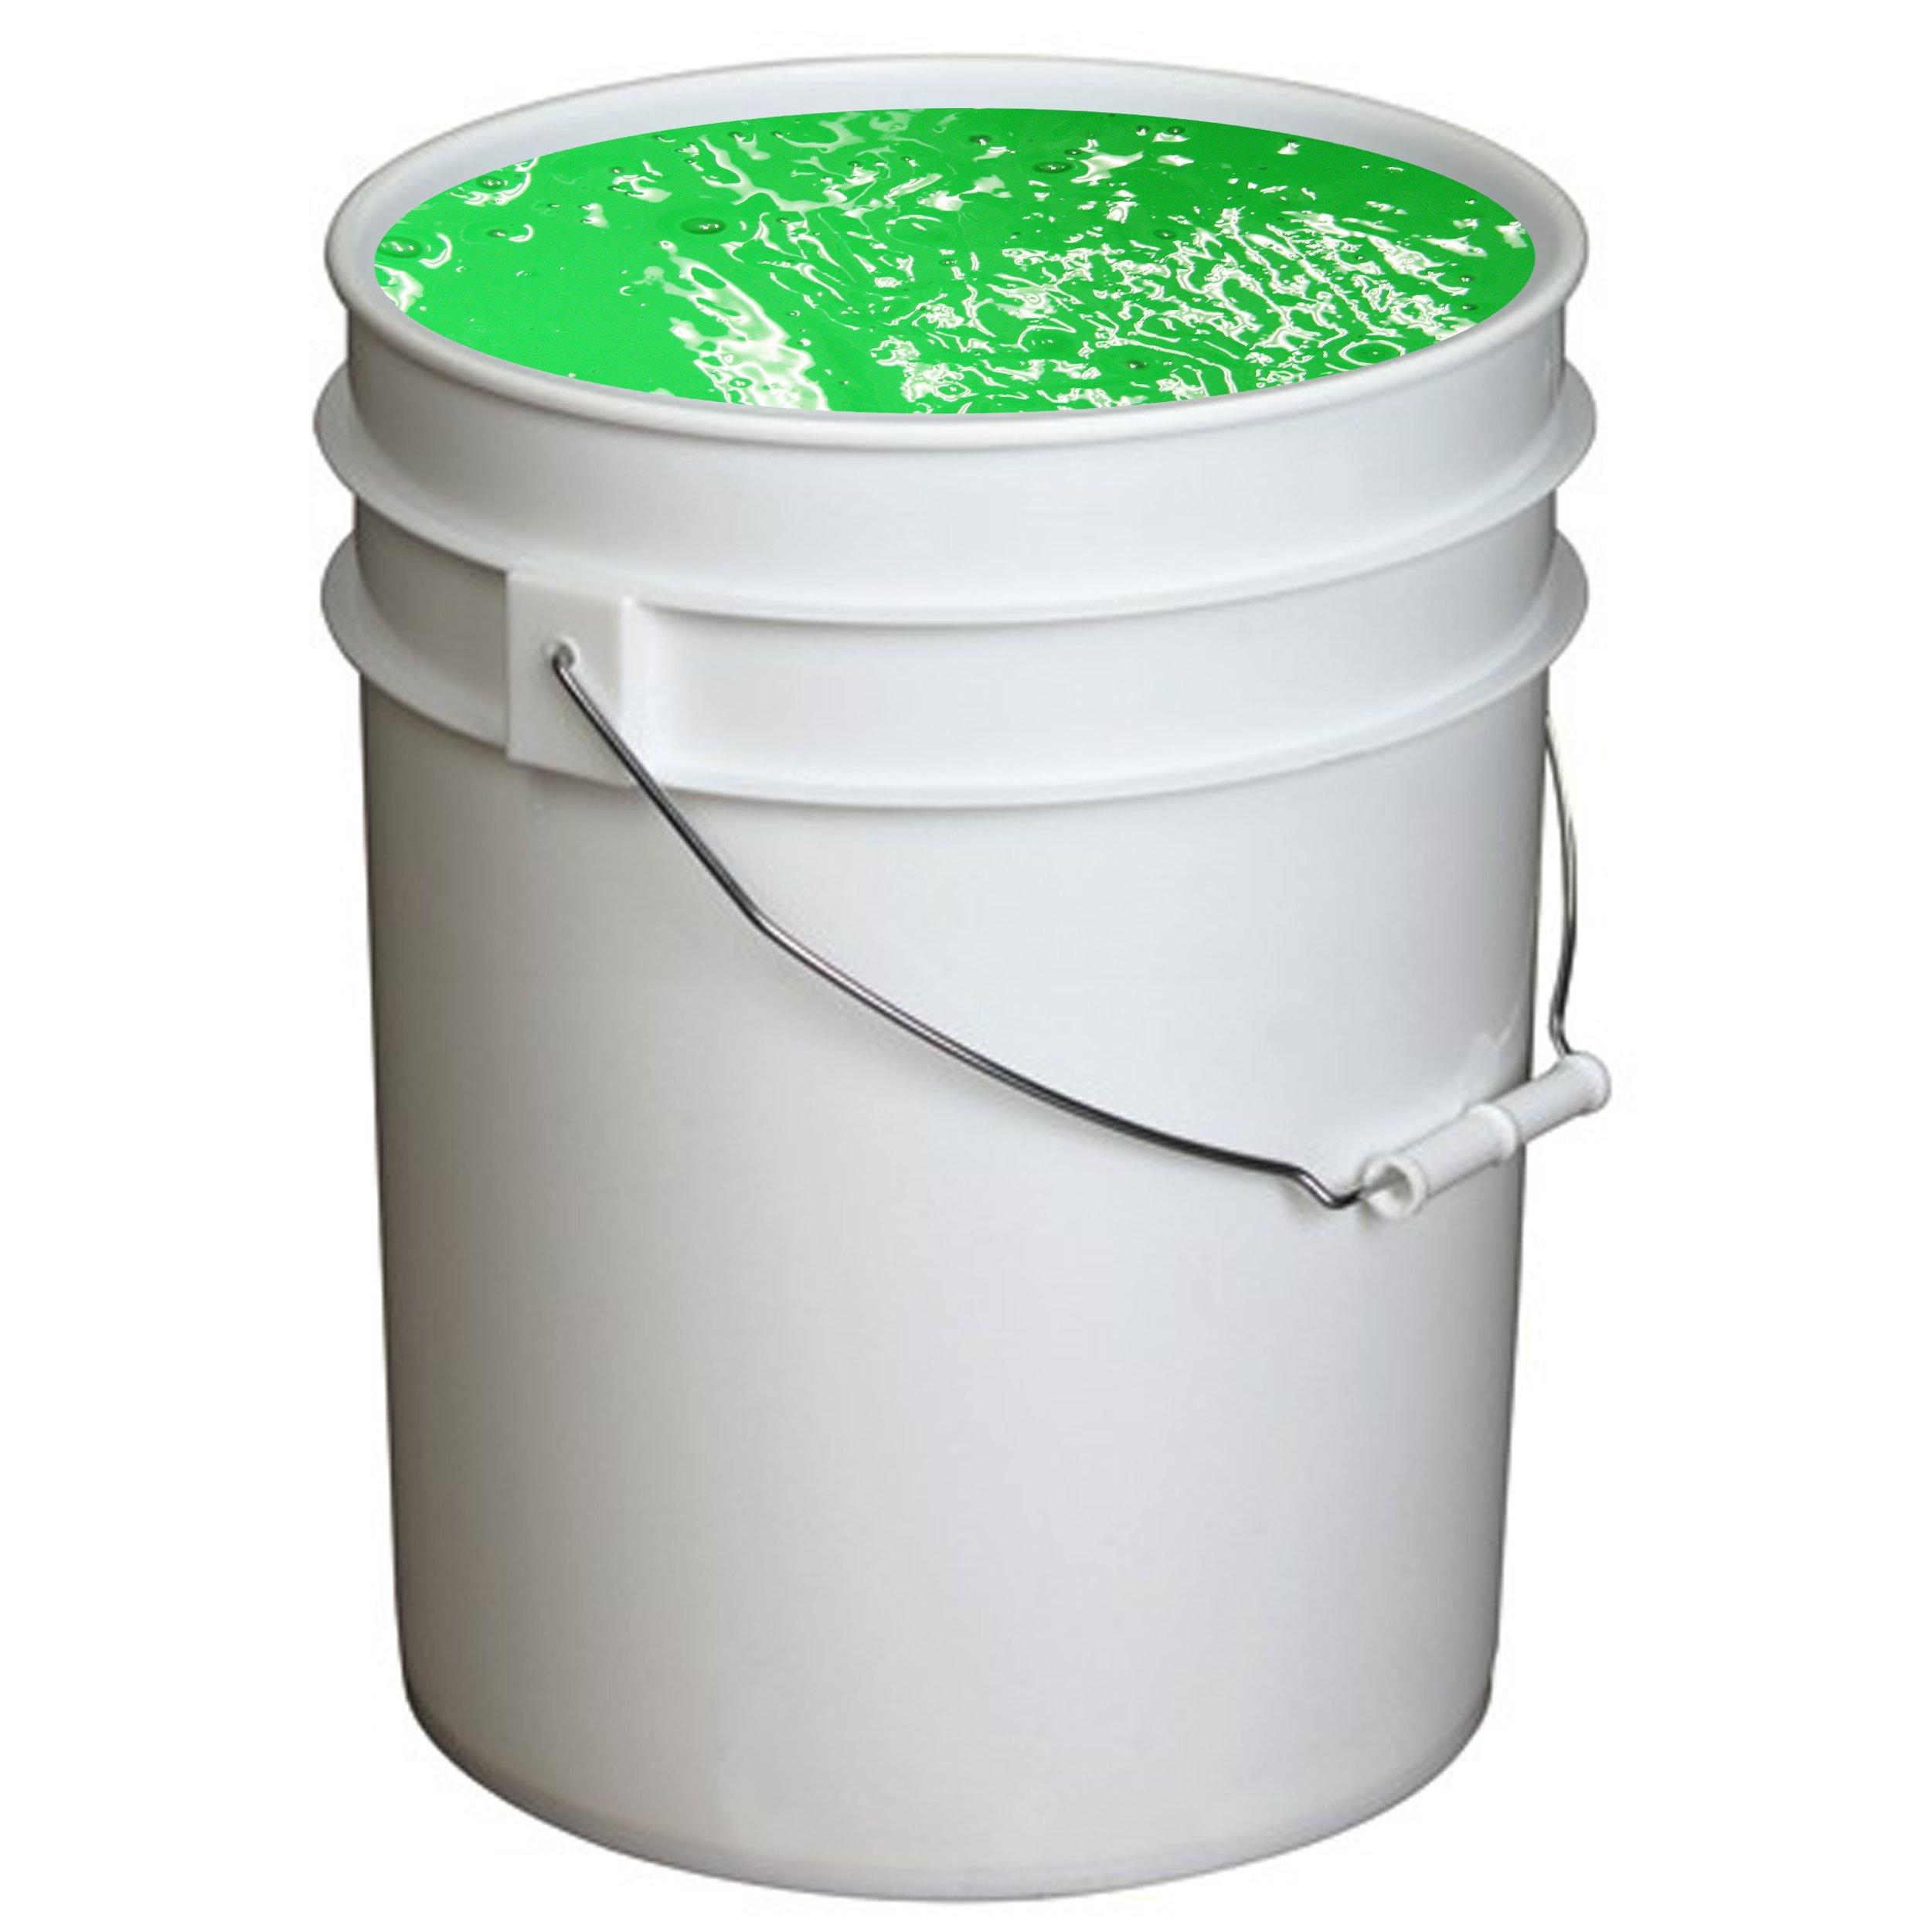 Handy Art UV Neon Event Paint in Bucket, 5-Gallon, Green